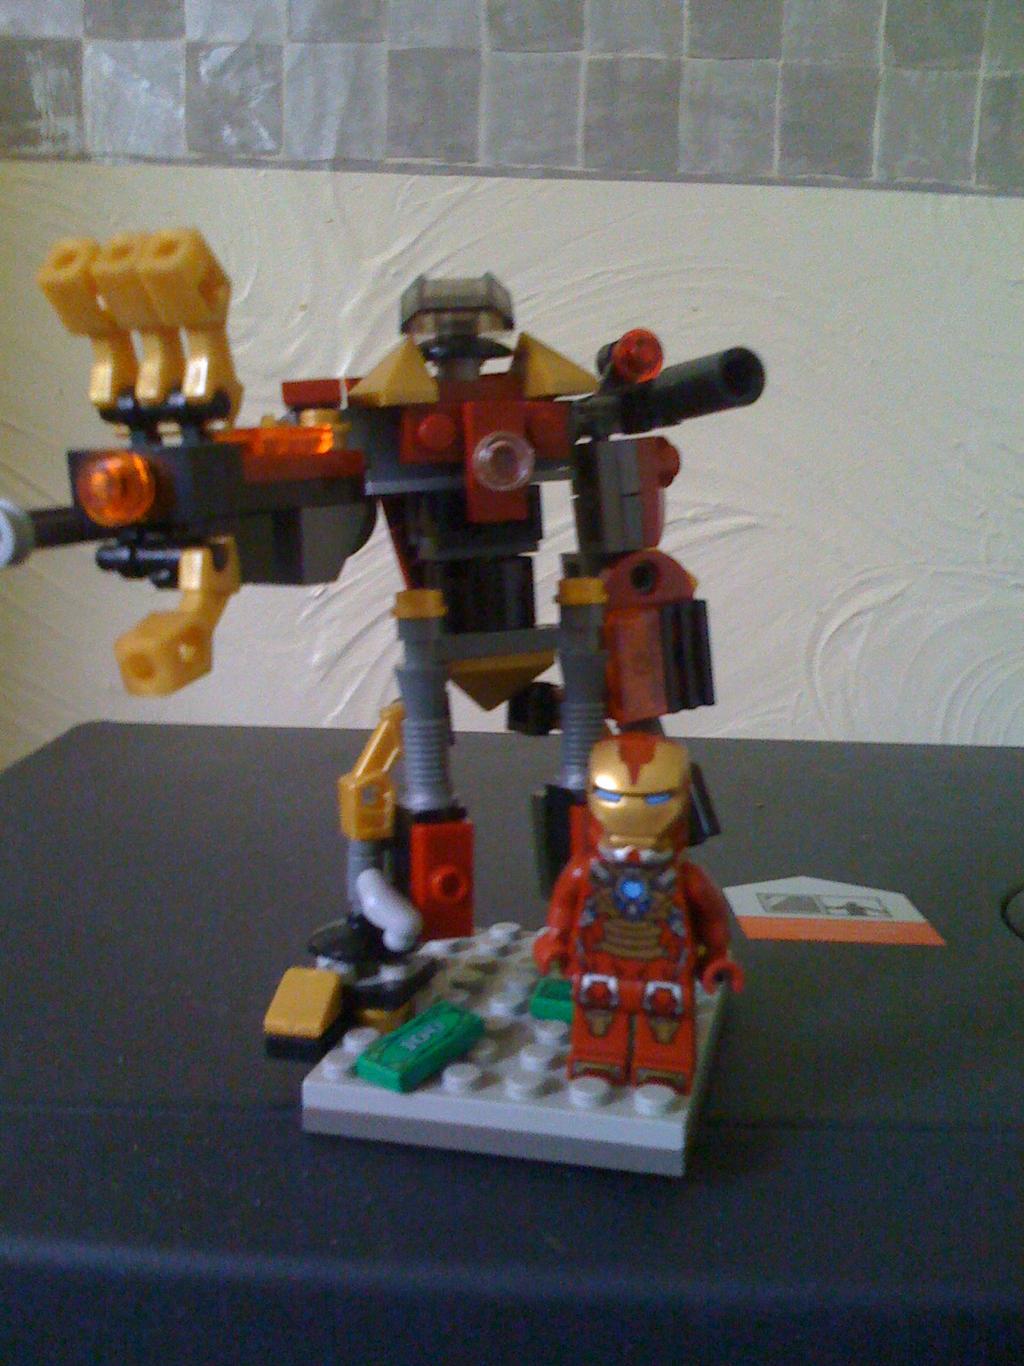 Lego iron man custom hulkbuster suit pic 3 by gozerth23 on